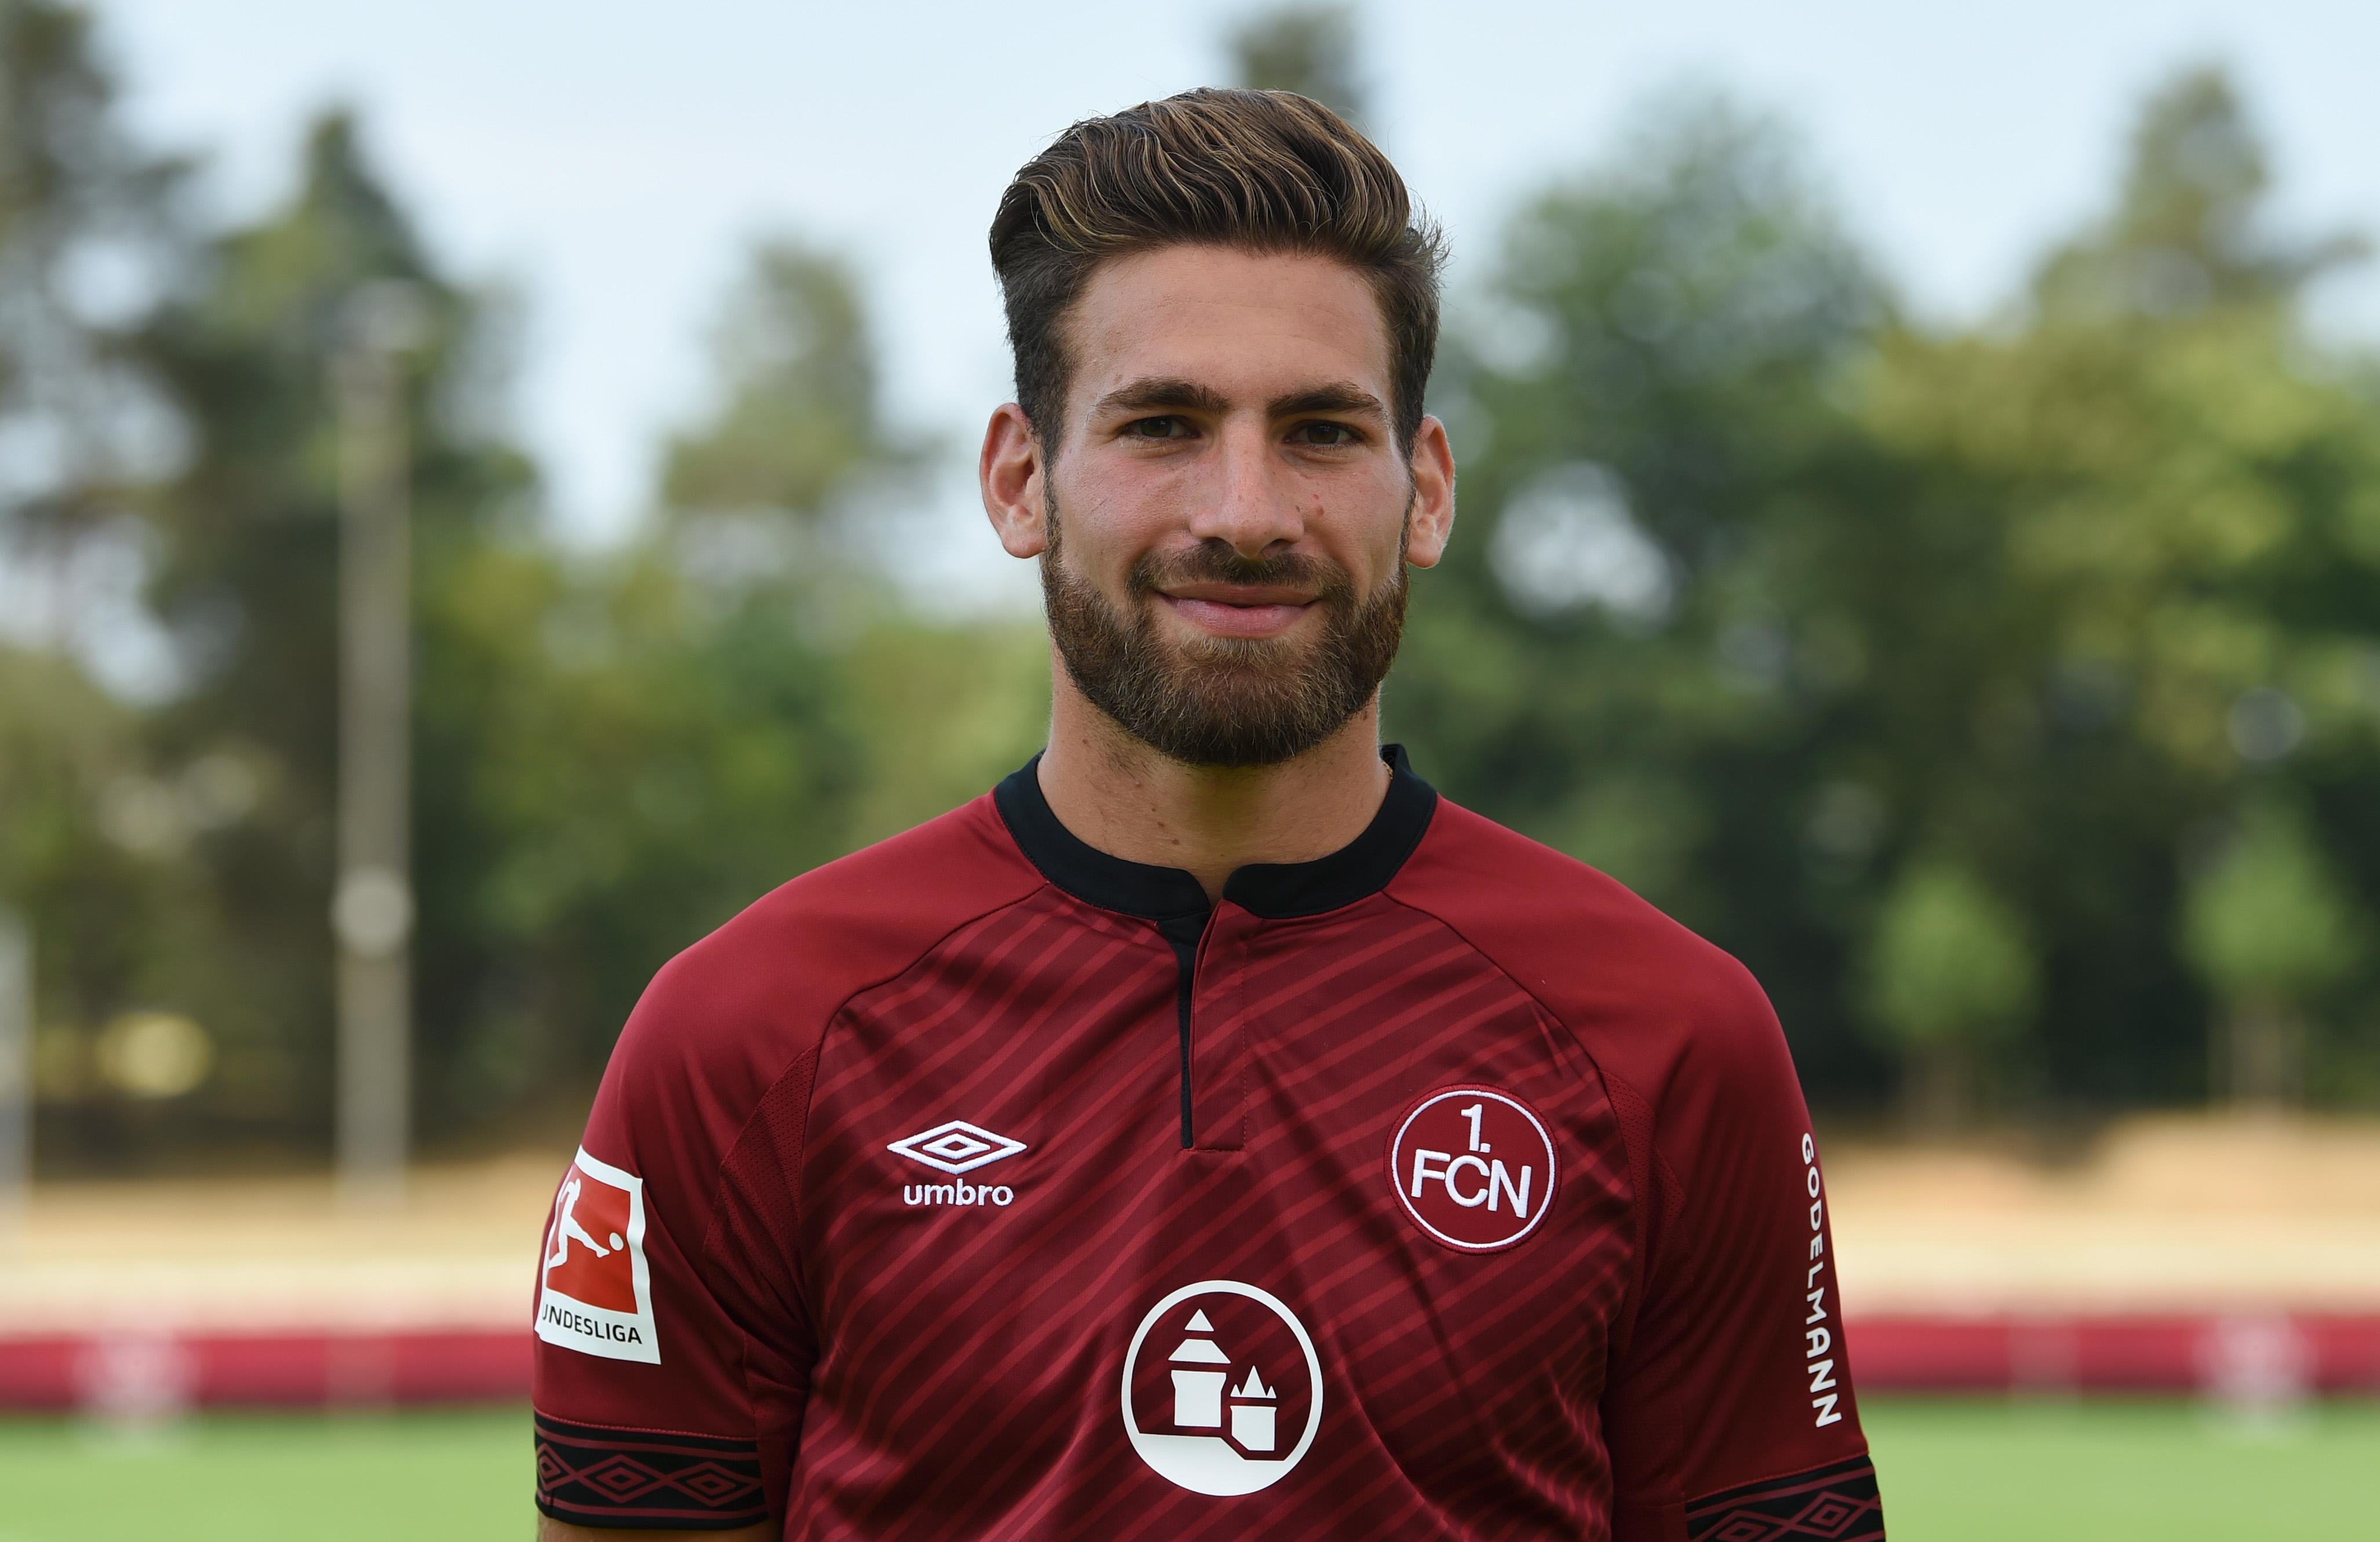 Ergebnis Fortuna Düsseldorf